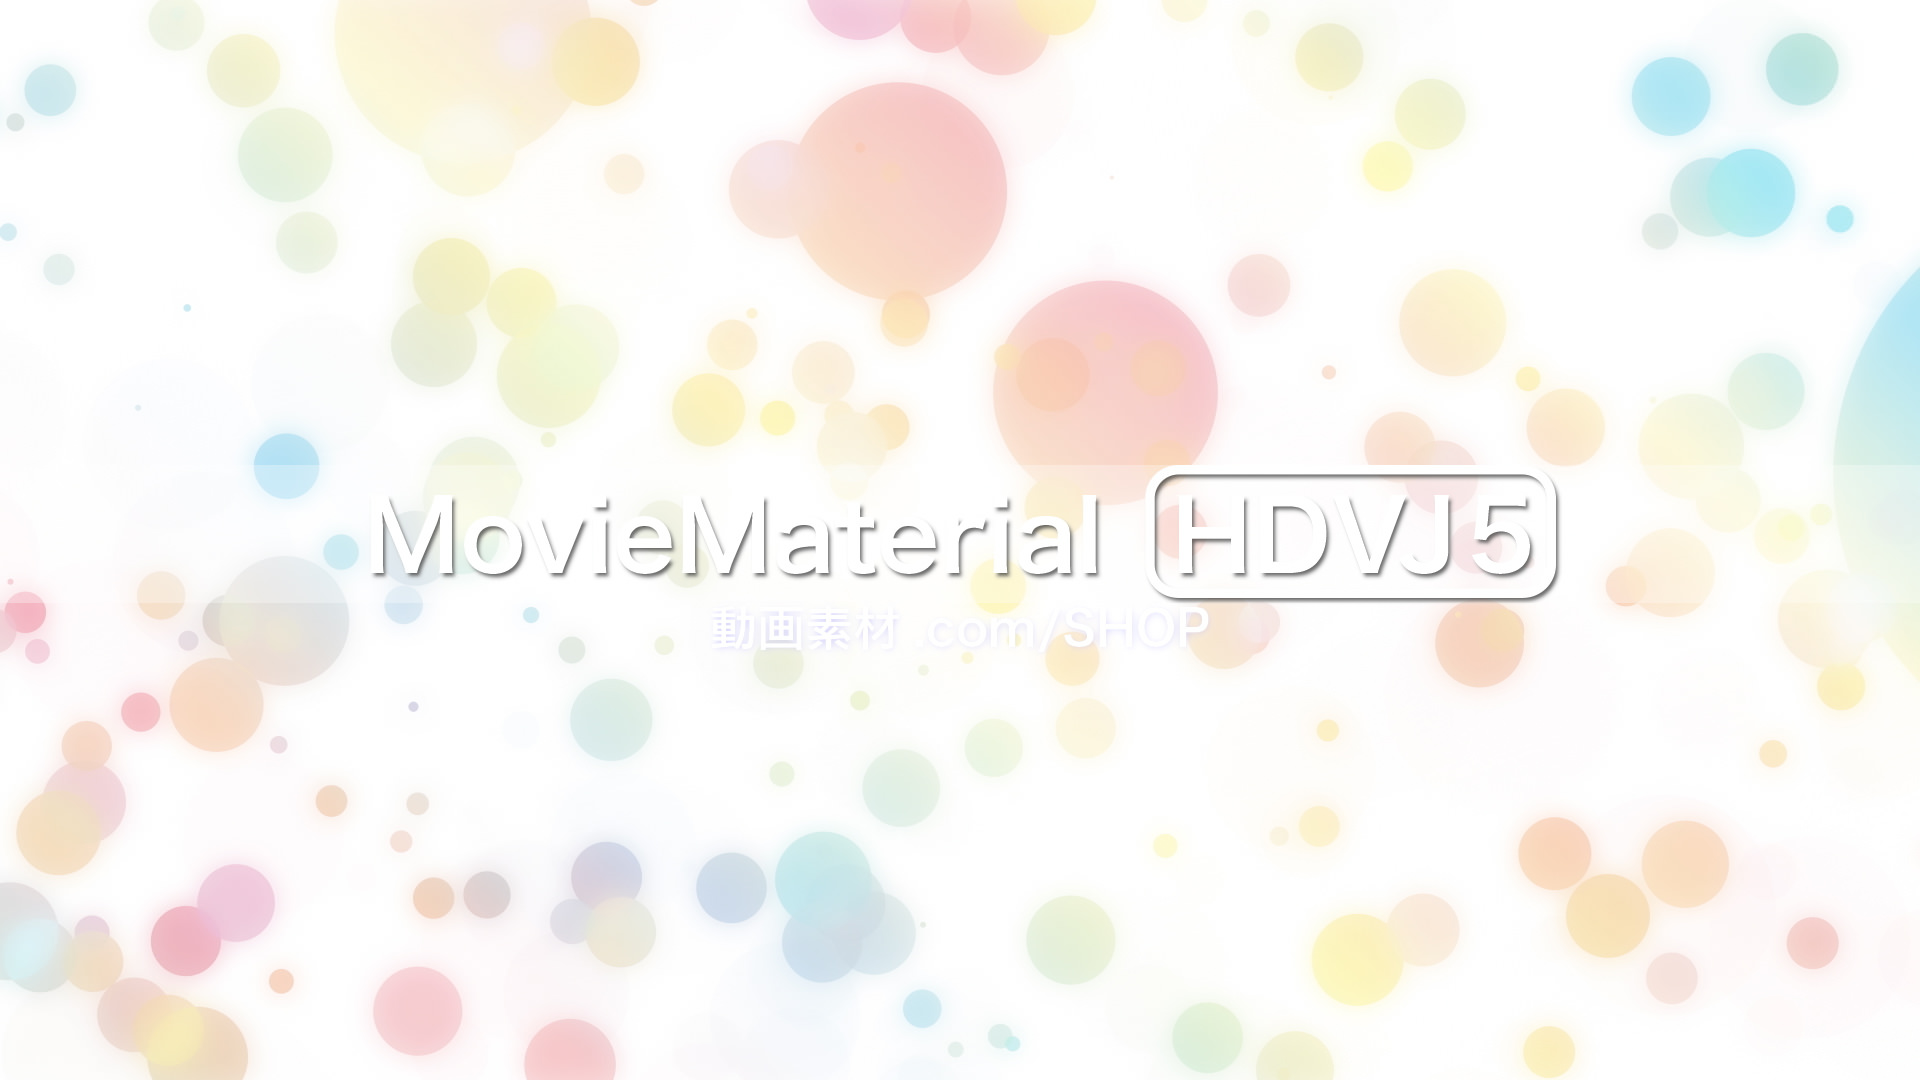 MovieMaterial HDVJ5 フルハイビジョンVJ動画素材集 画像8